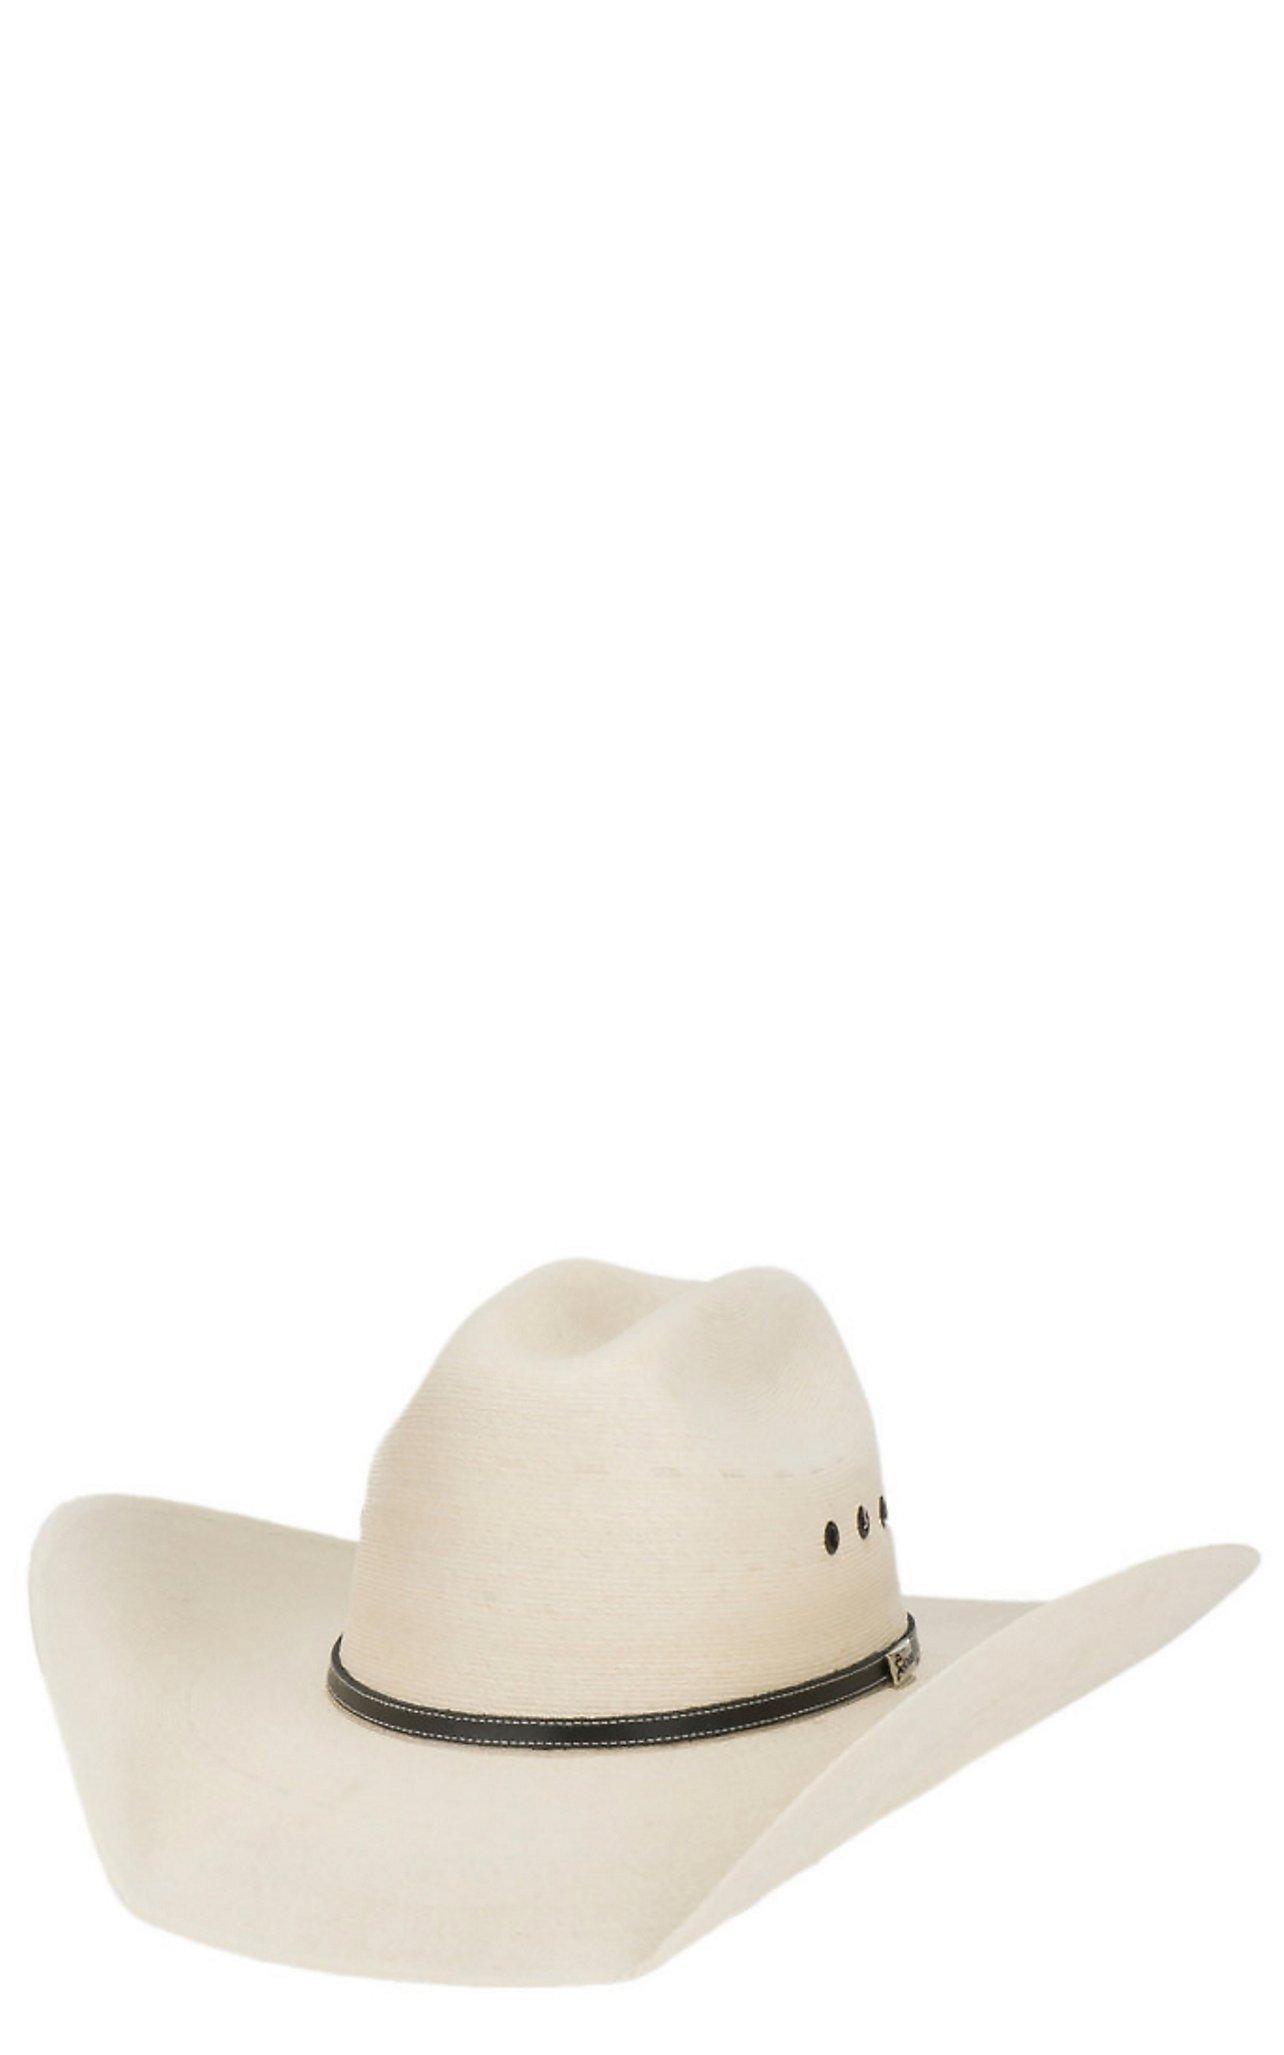 Atwood Hat  Atwood Swenson Fine Palm Leaf Cowboy Hat 450c8994b3c0